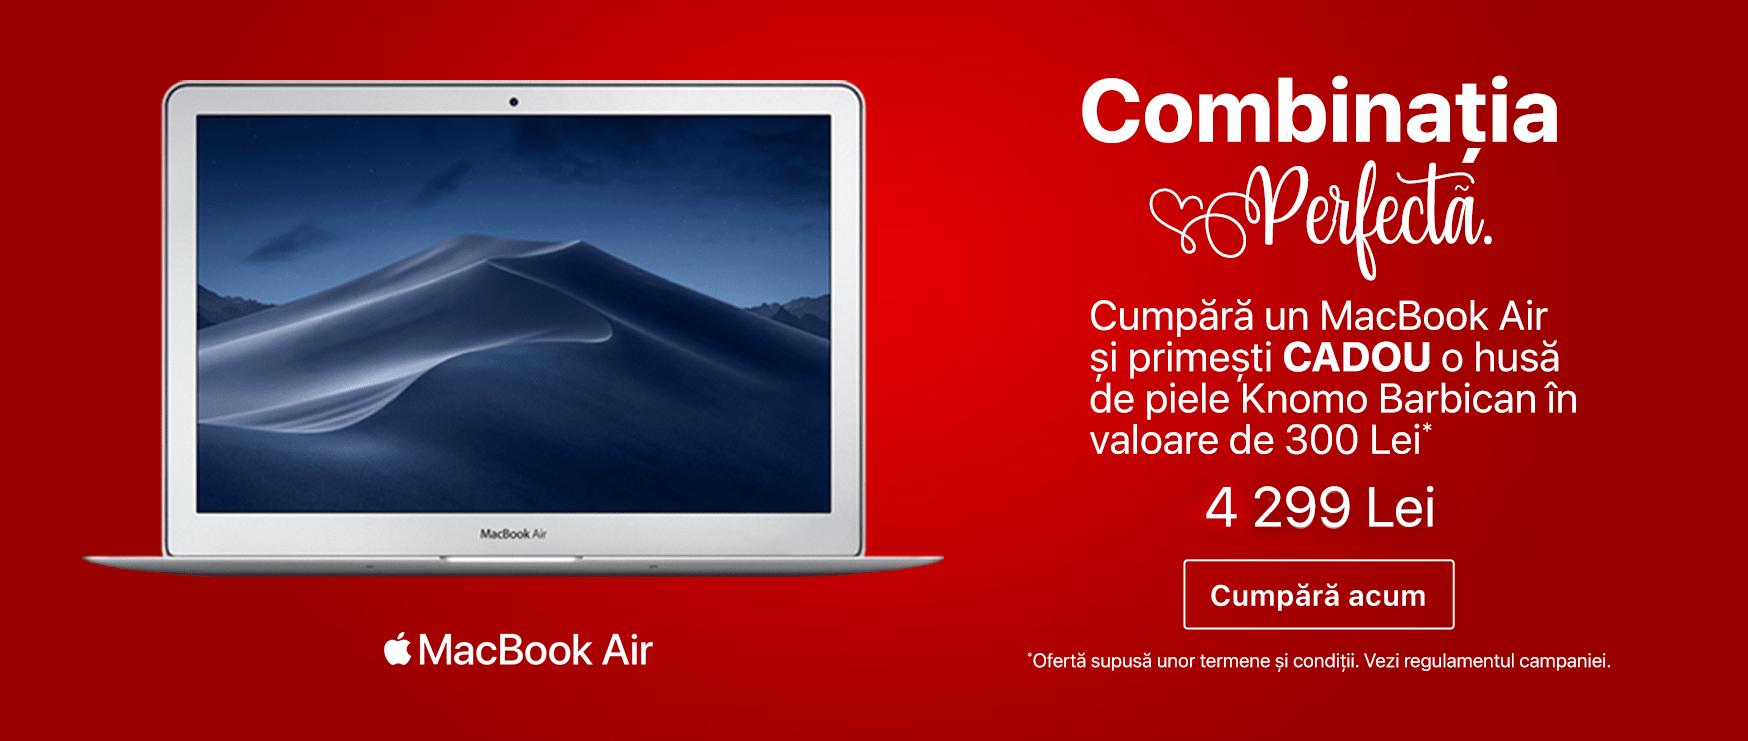 MacBook Air + Husa cadou